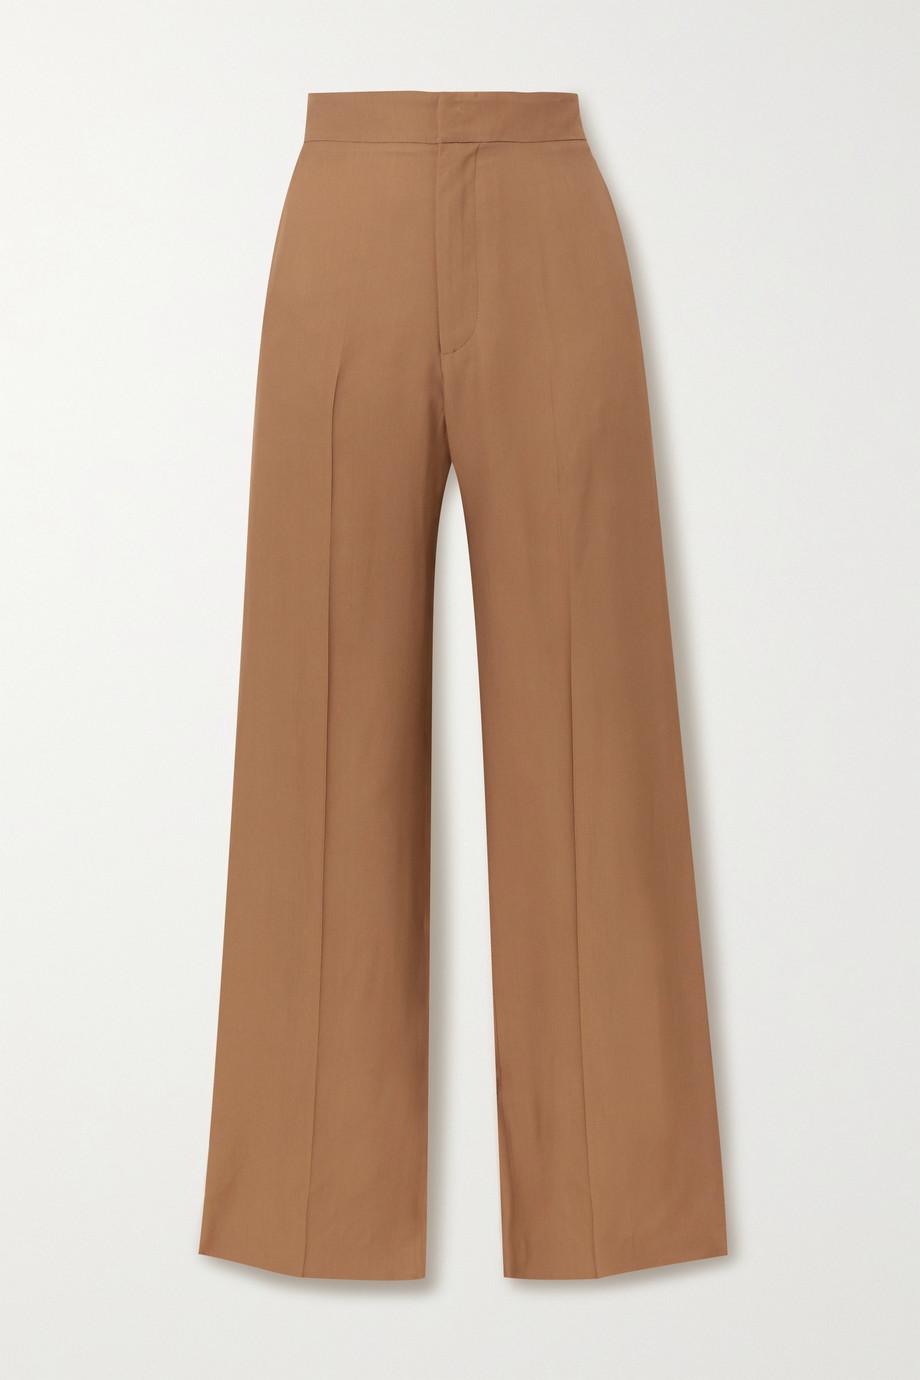 GAUCHERE Rilla twill straight-leg pants